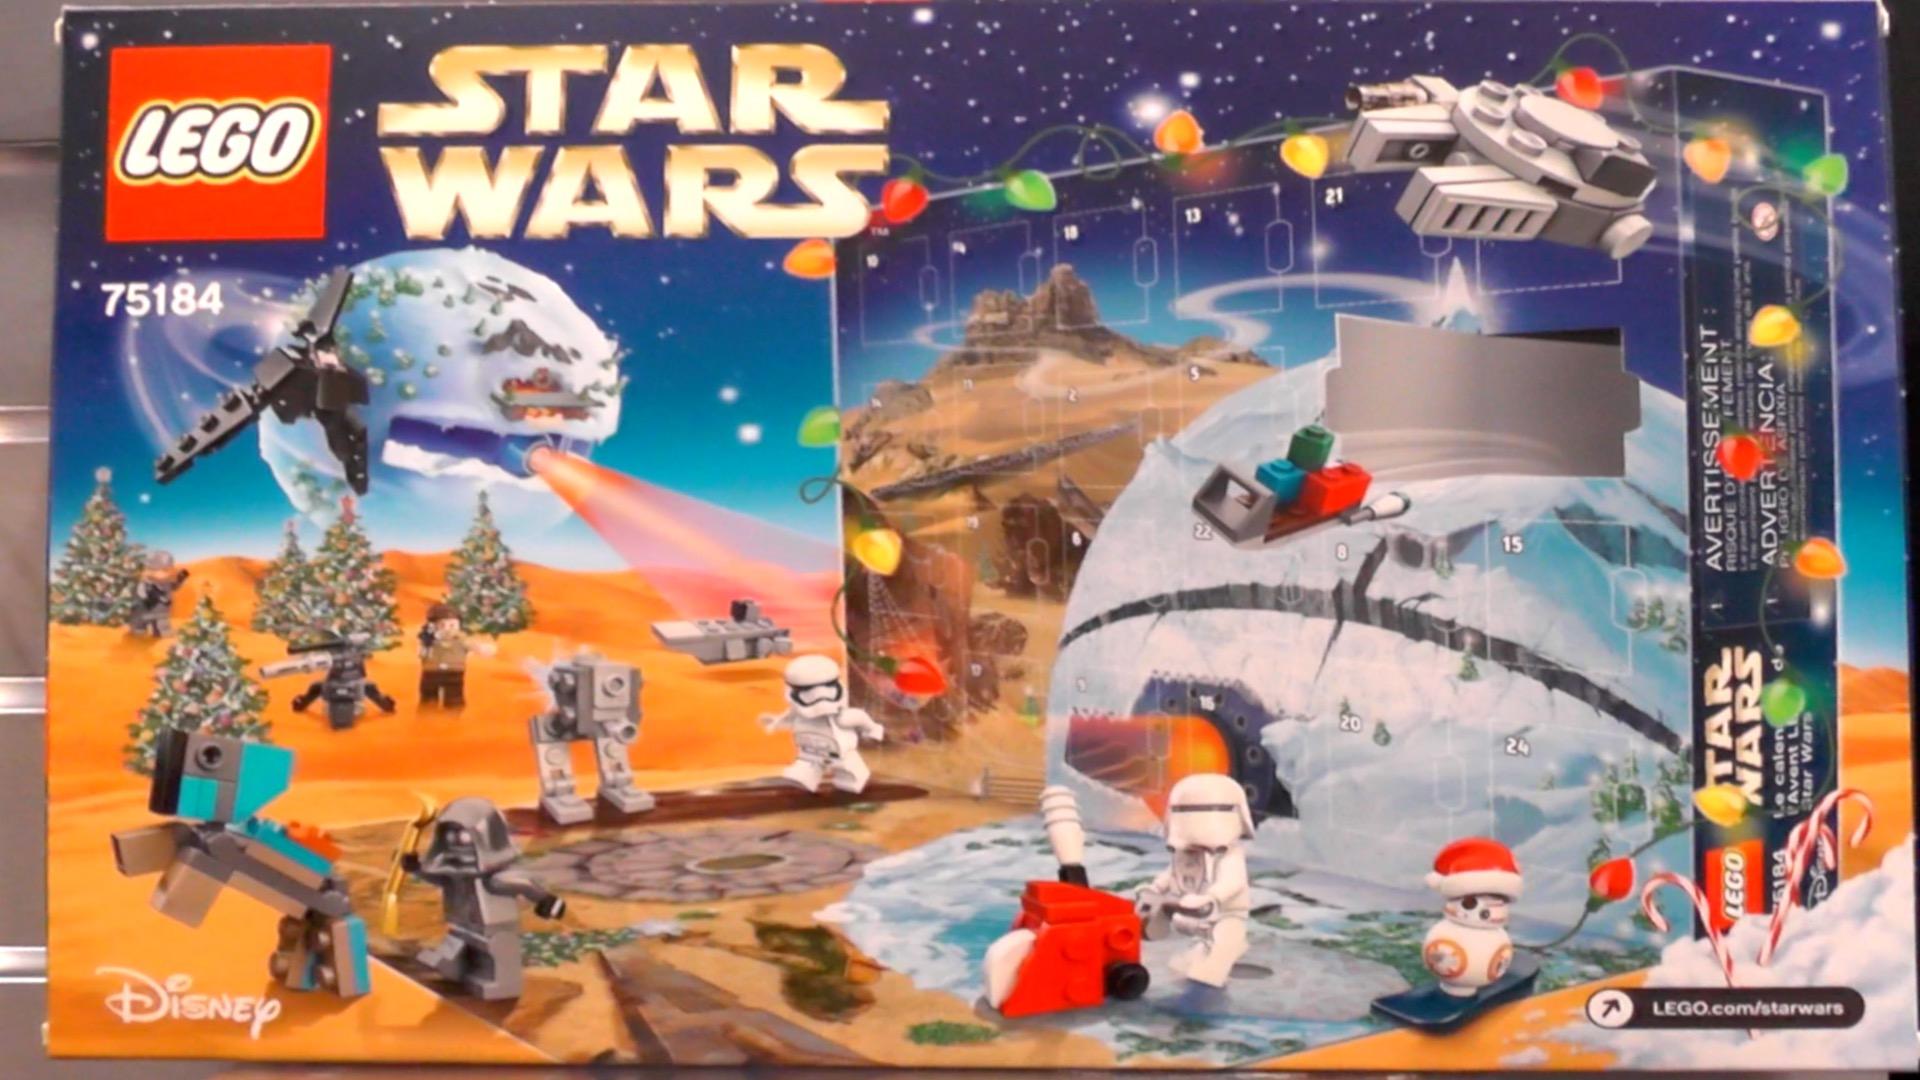 Snowboarding Lego Bb 8 Heads 2017 Star Wars Advent